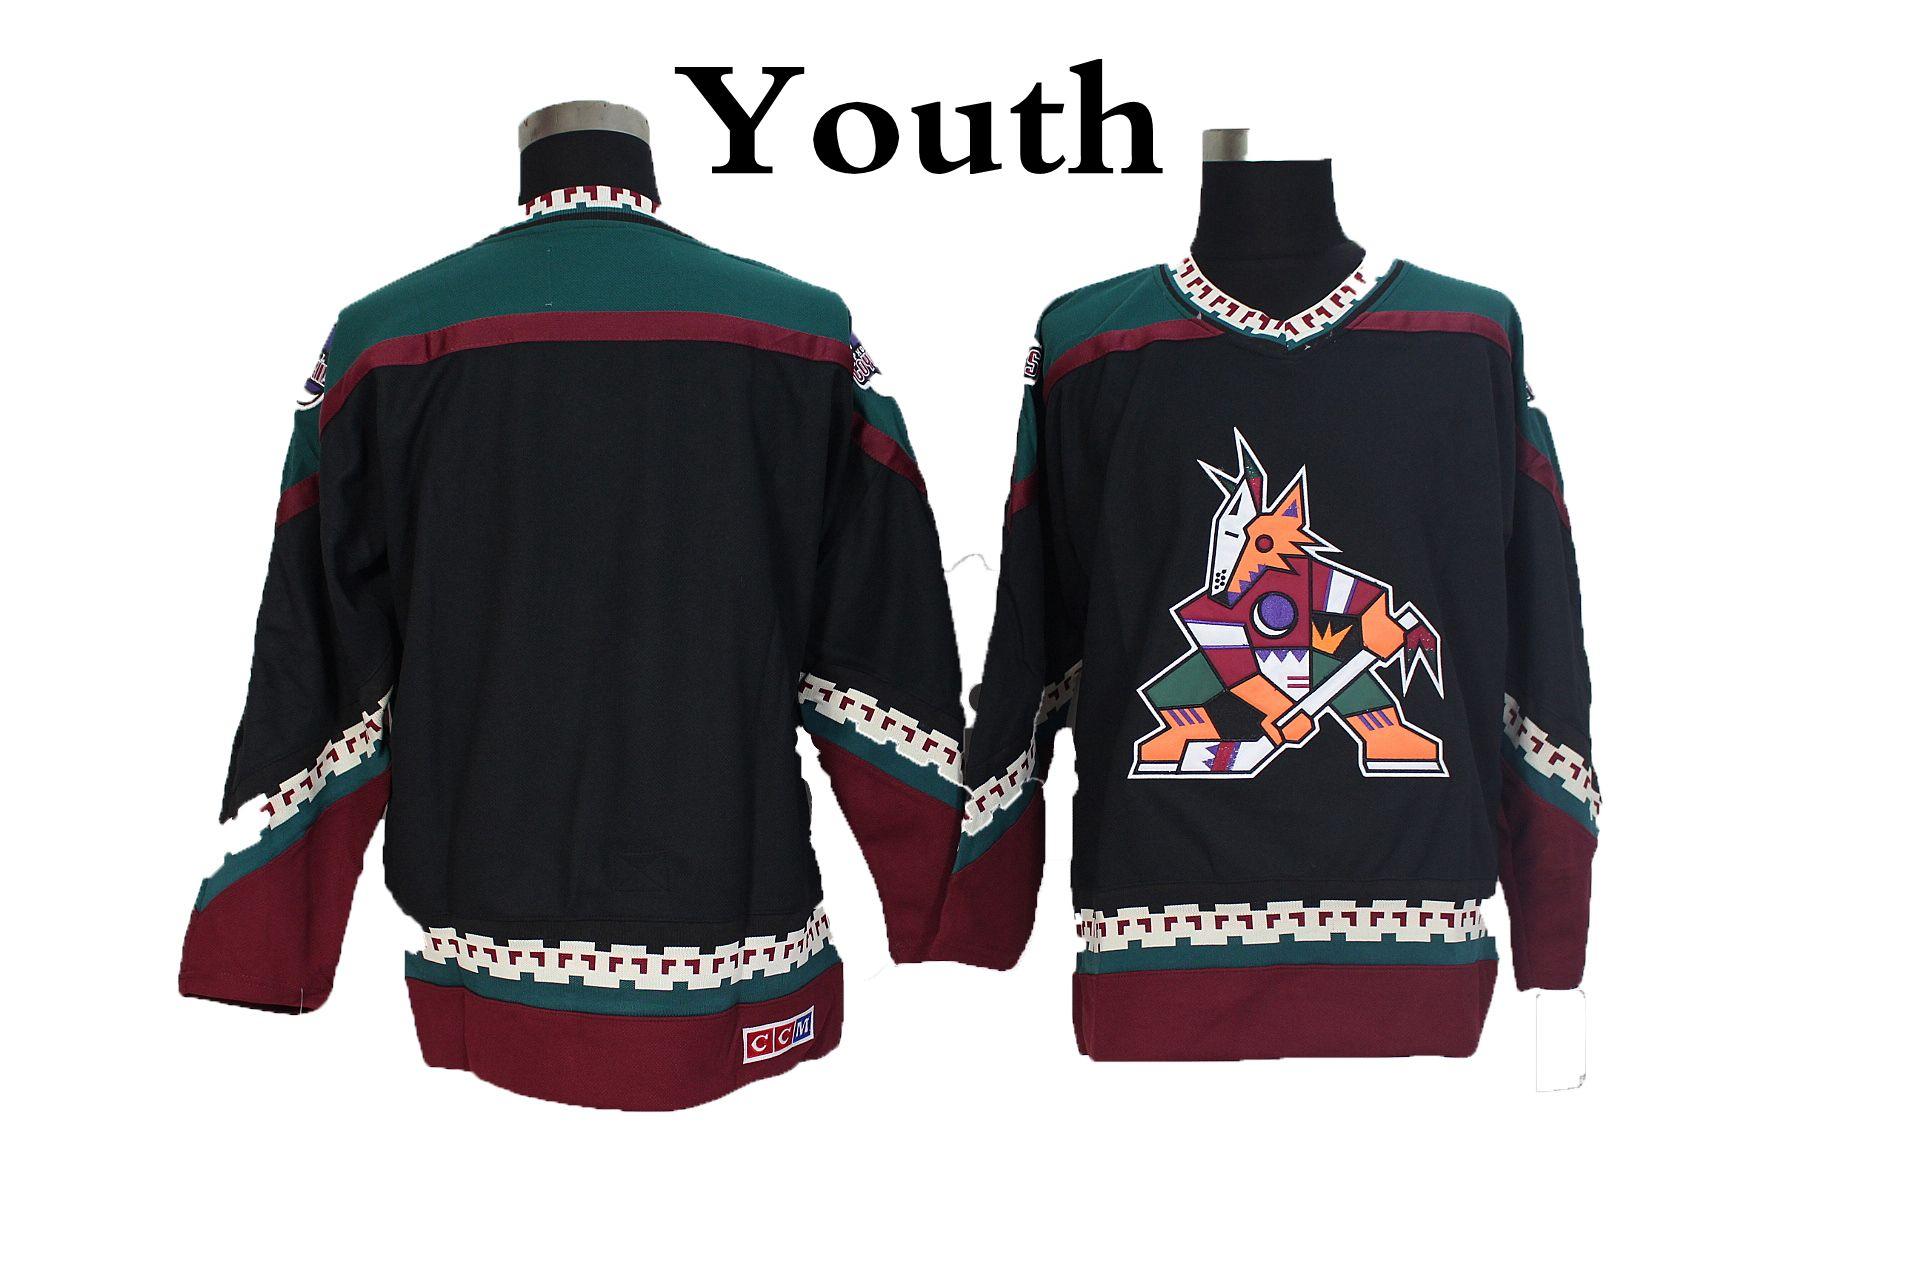 2019 Youth Retro Phoenix Coyotes Hockey Jerseys Black Blank Vintage Arizona  Coyotes Retro Kids Jerseys CCM Stitched Boys Hockey Shirts From  Redtradesport b756eaffd